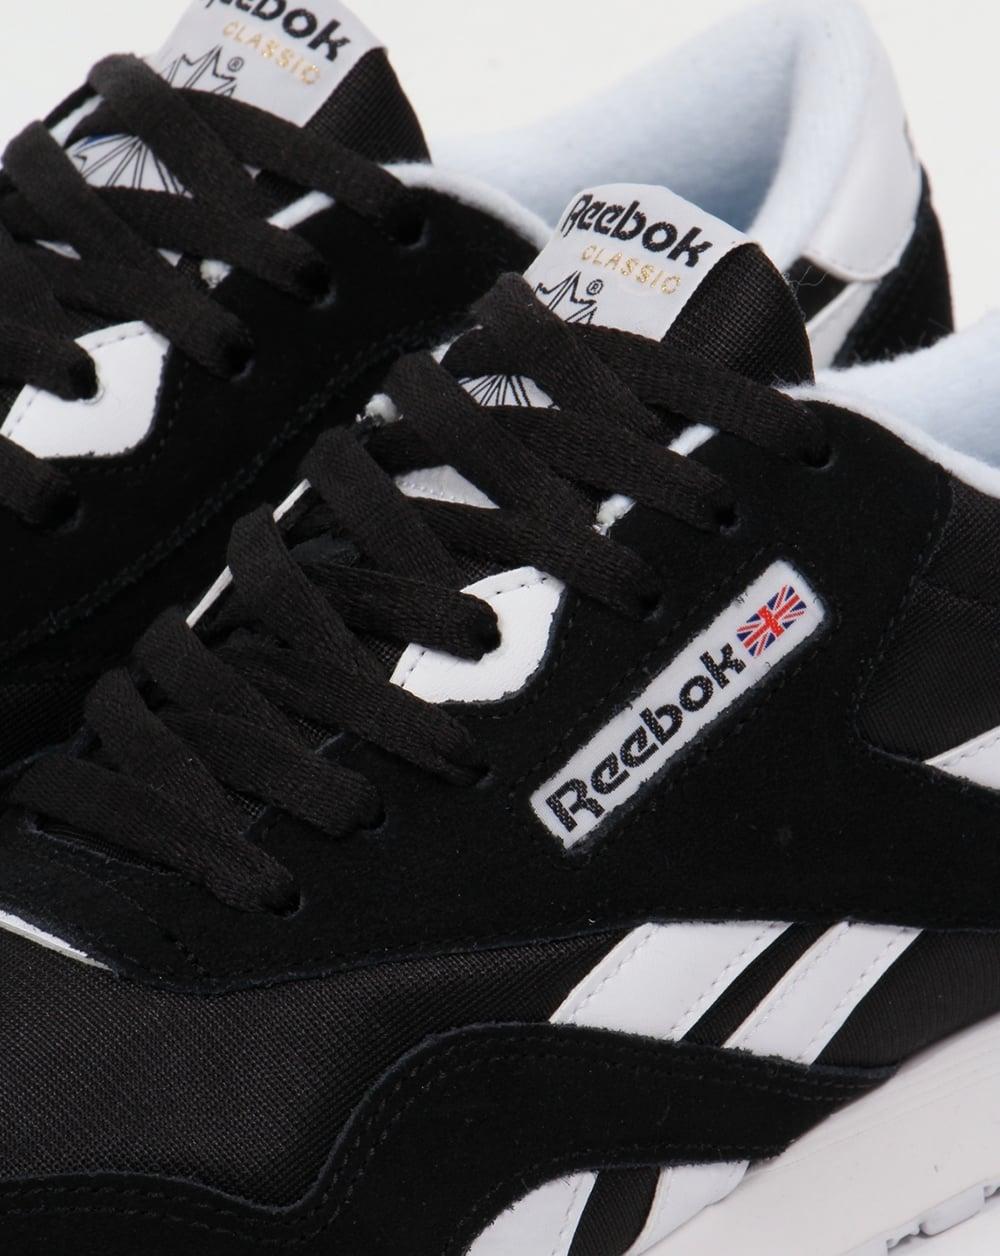 e01261d771af05 Reebok Classic Nylon Trainers Black White